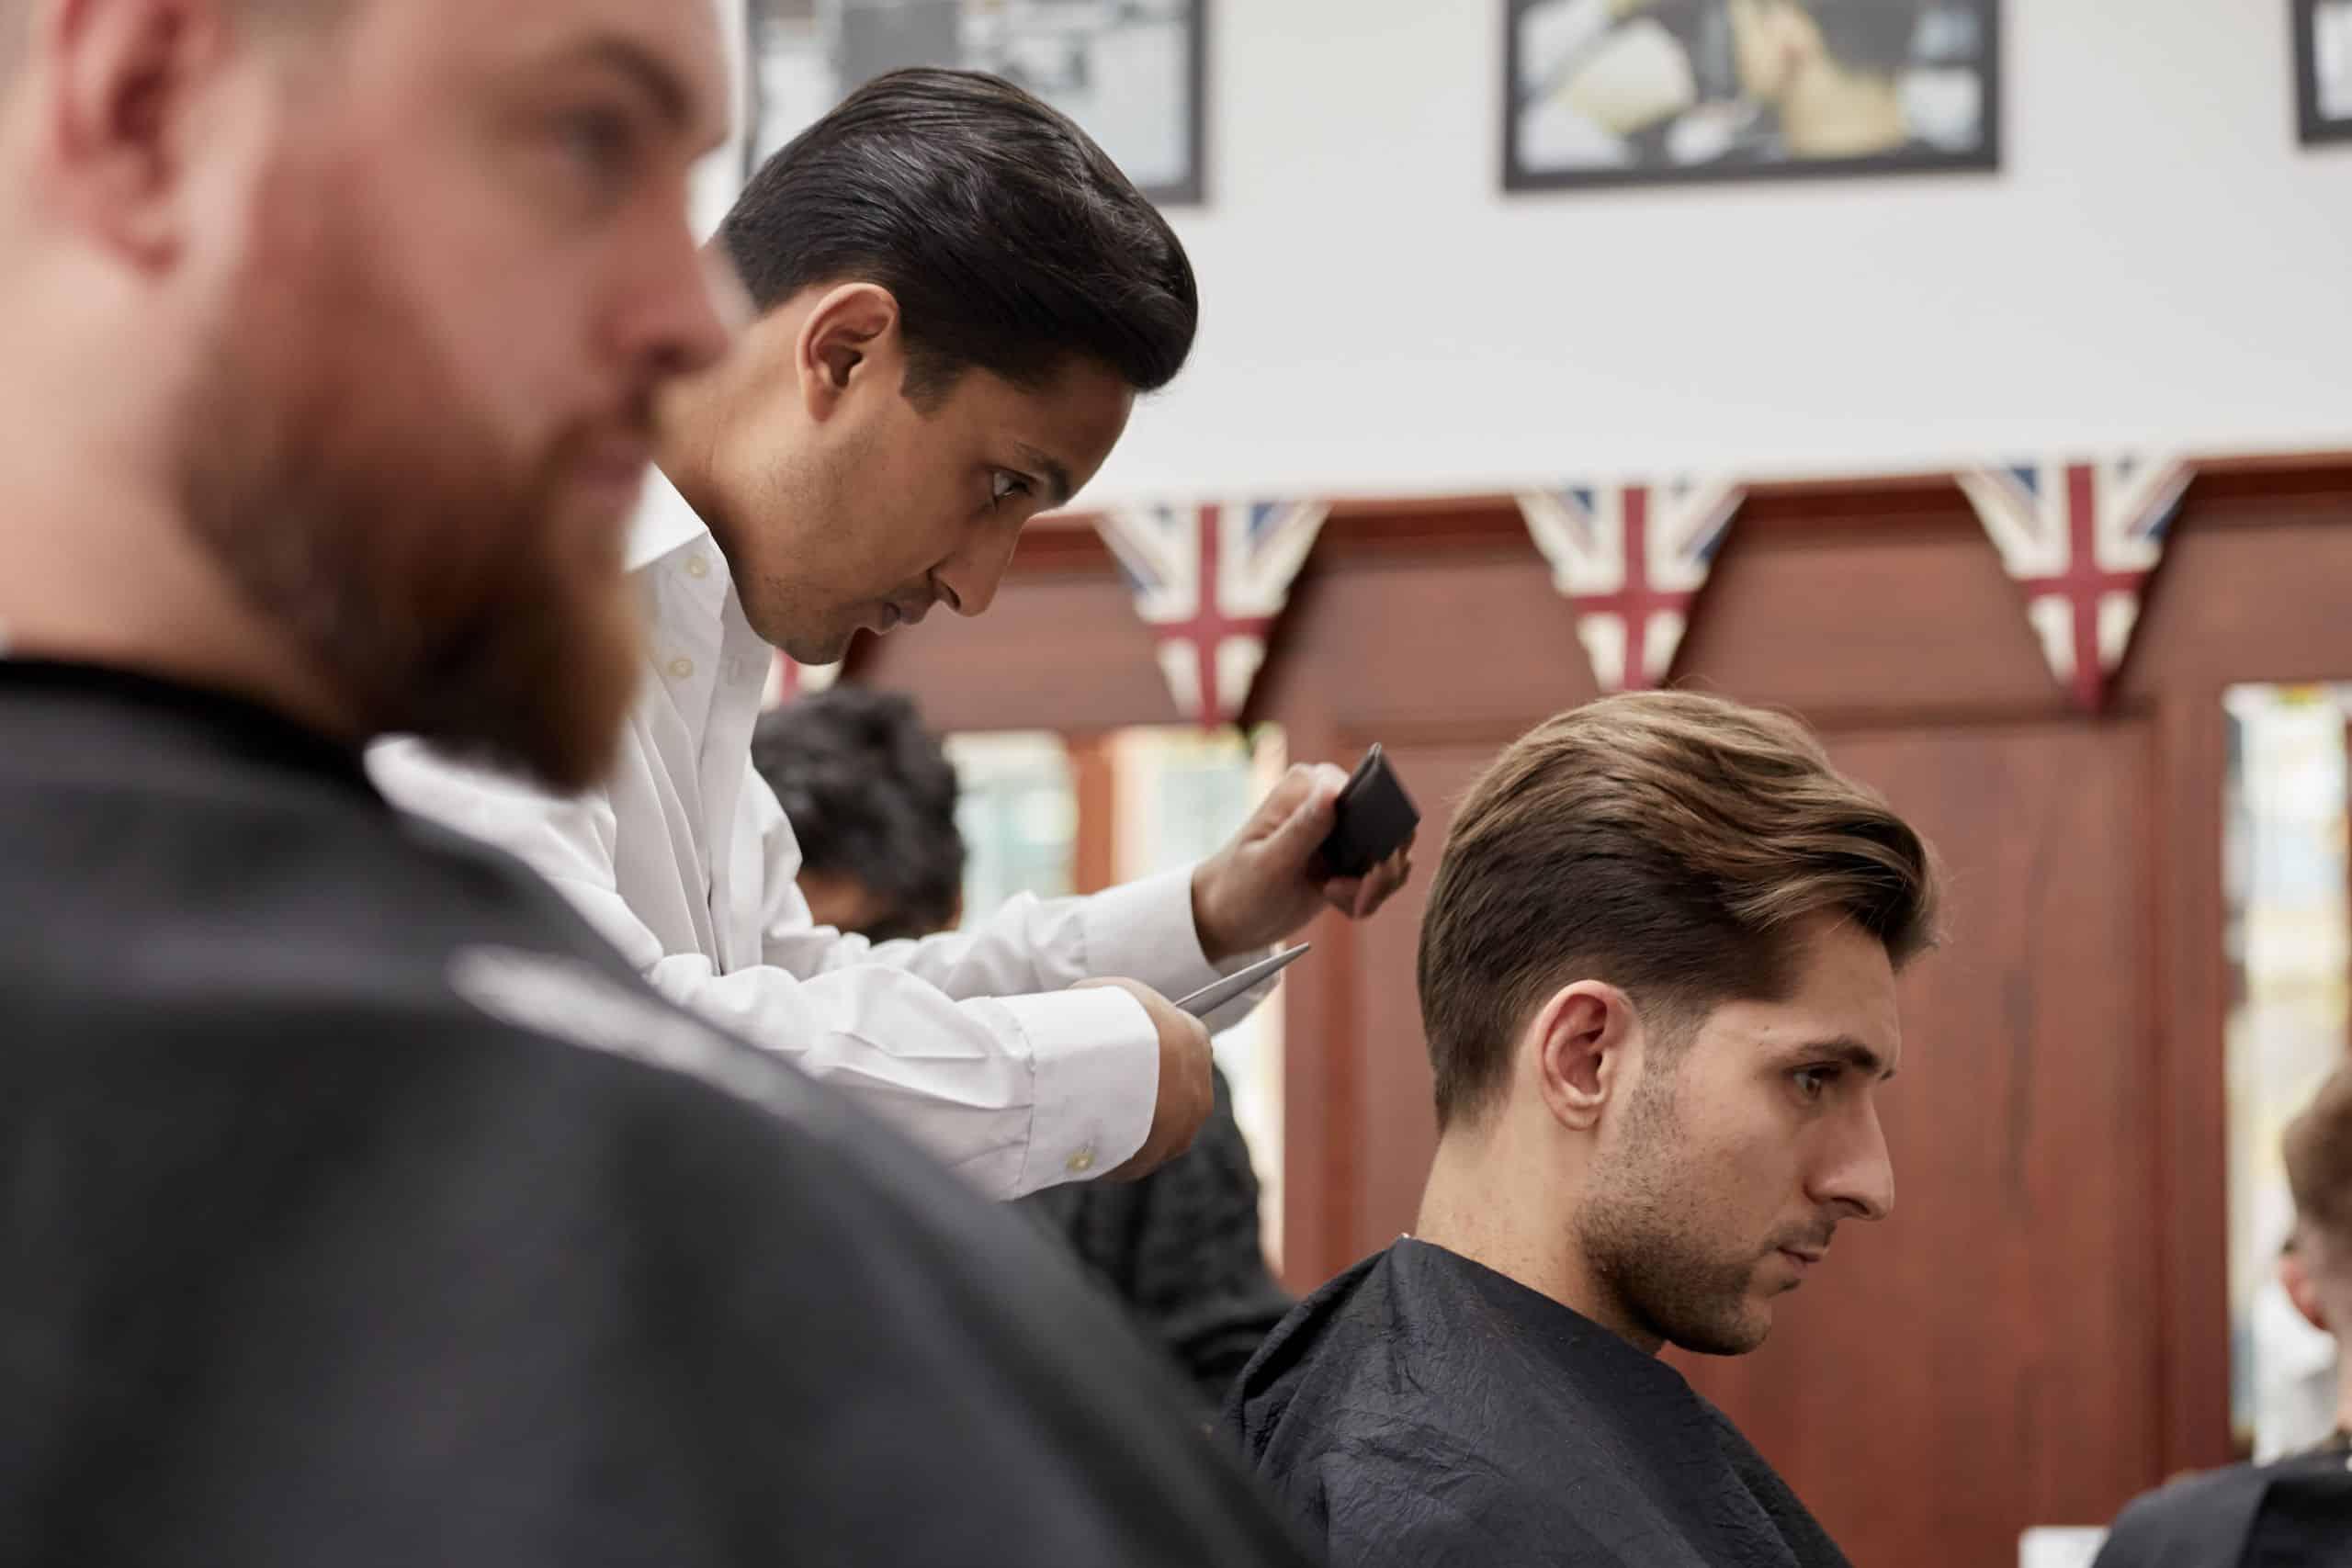 Pall Mall Barbers Fitzrovia | Beard Trims | Hair Cuts | Best Barbers London | barbers Euston Barbers Baker Street, barber, barbers, barber shop,